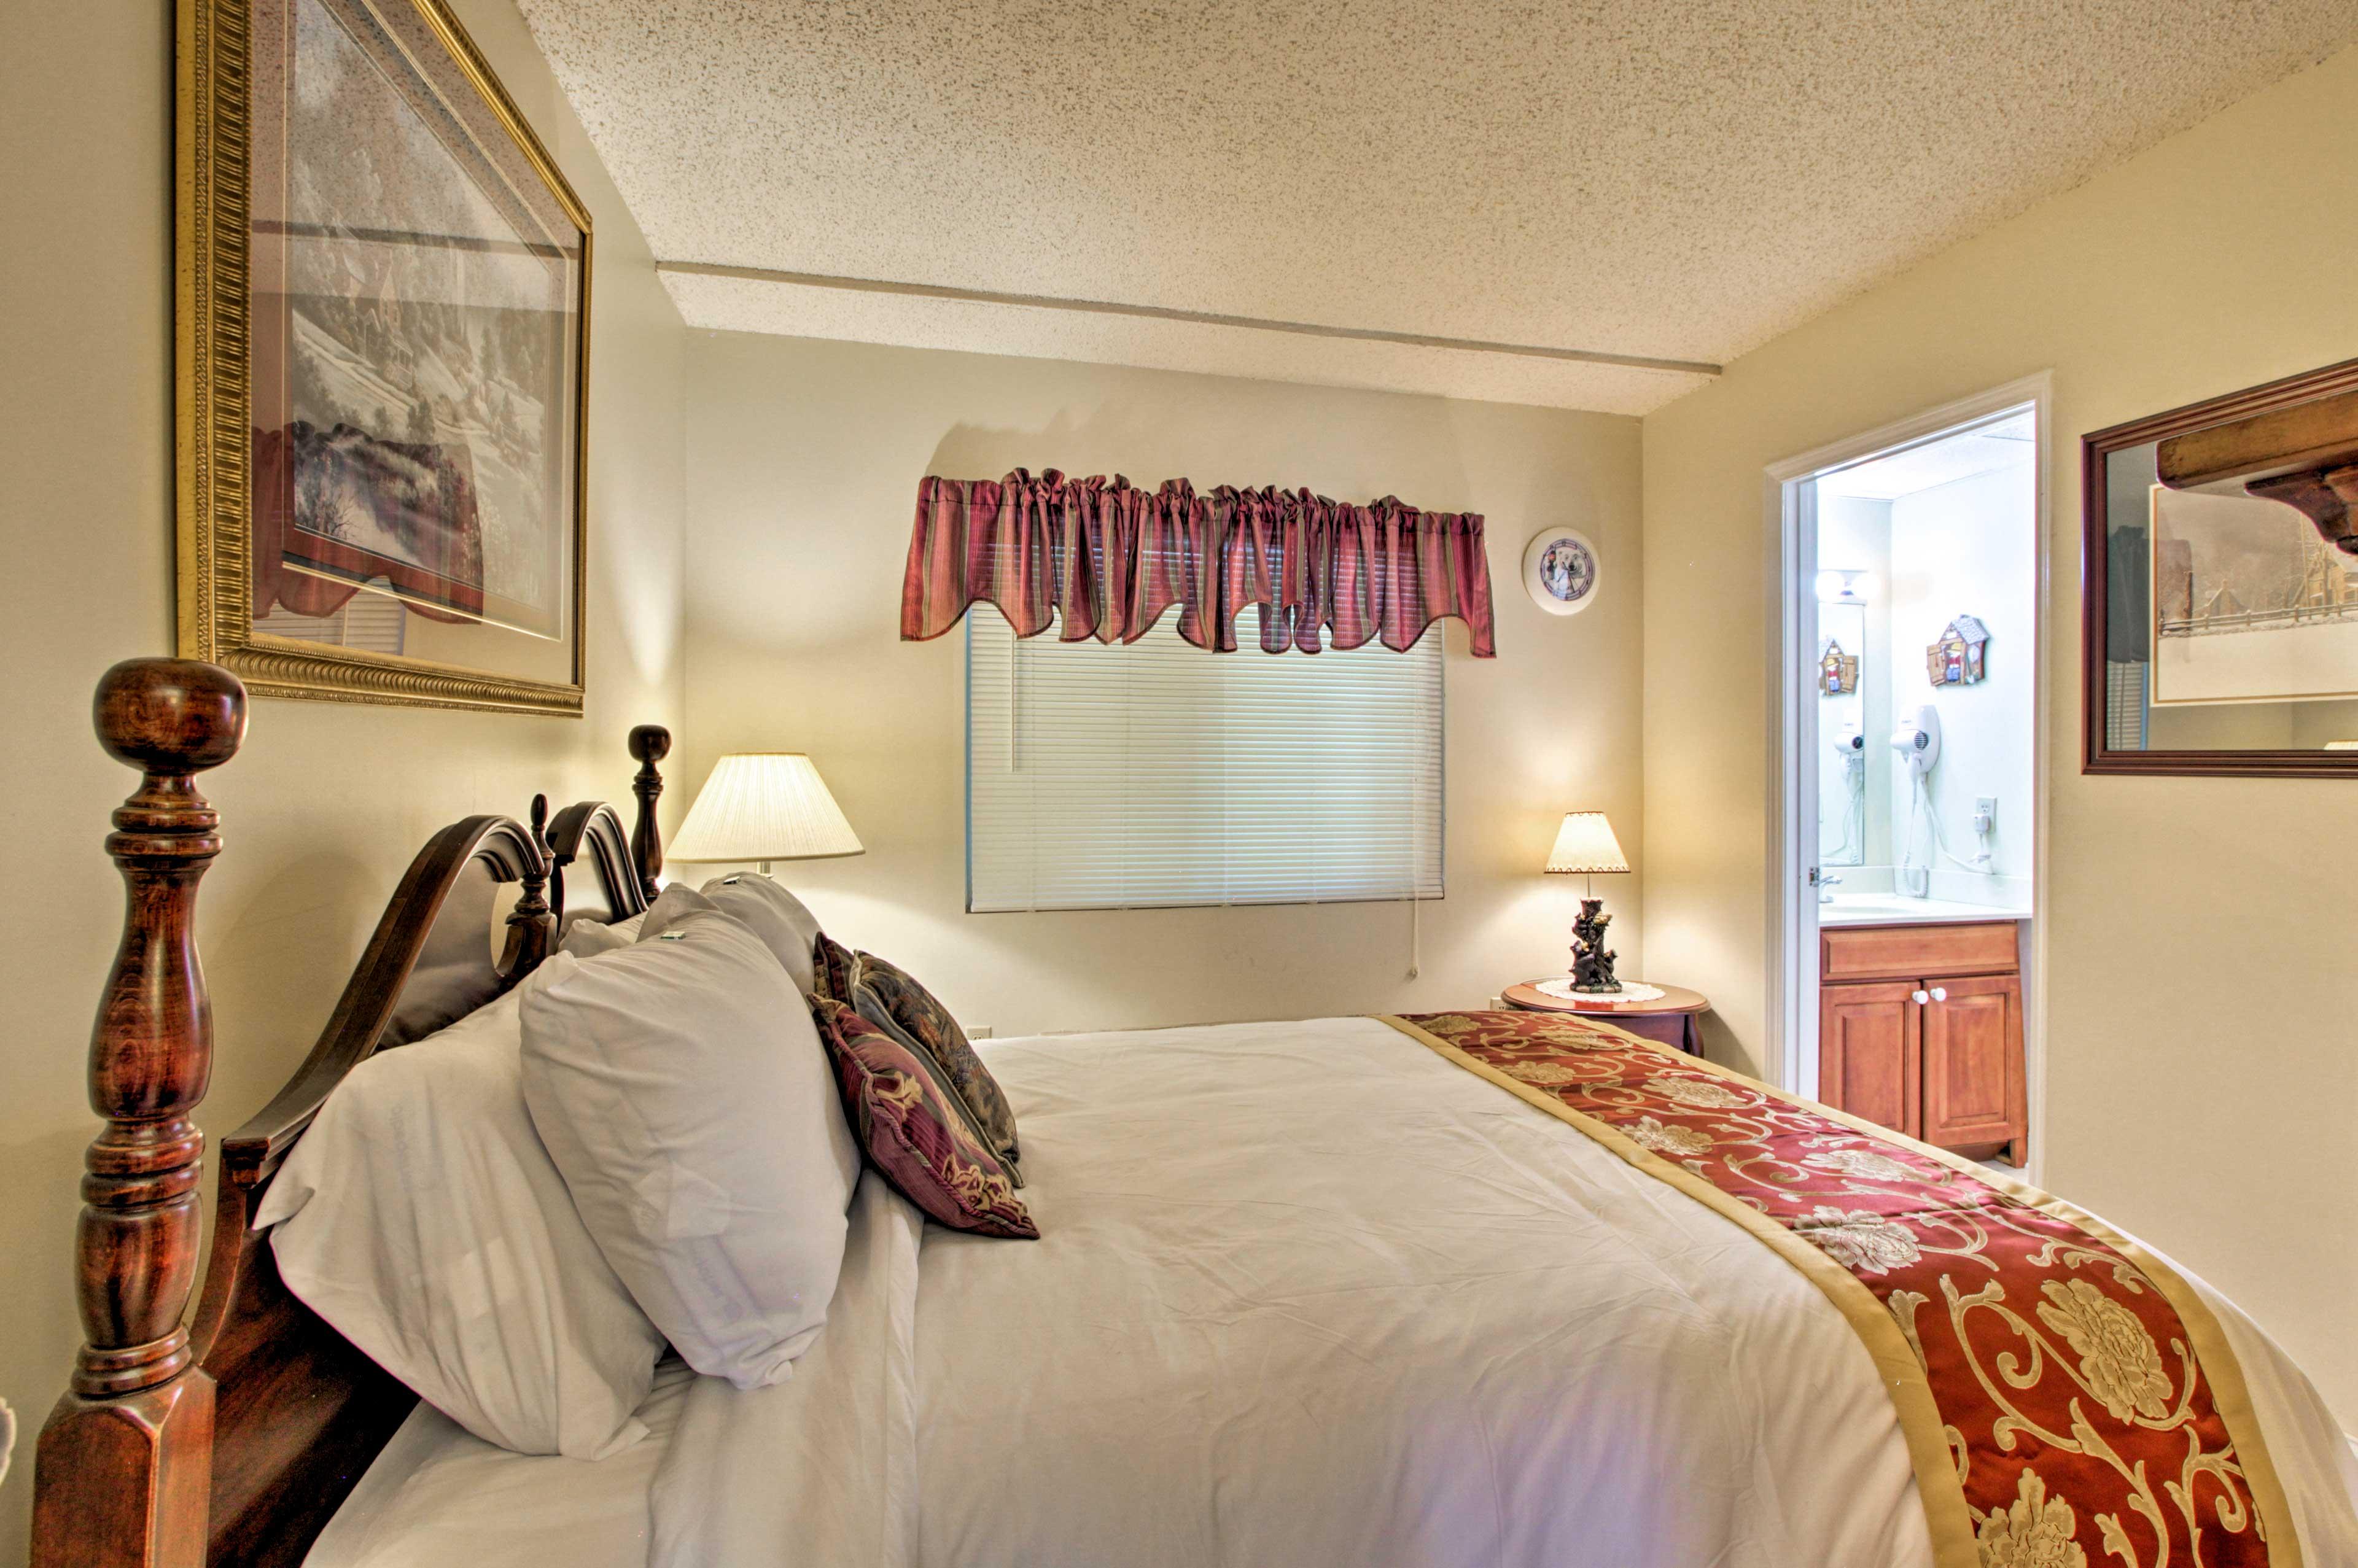 Plenty of pillows ensure you'll get a good night of sleep!